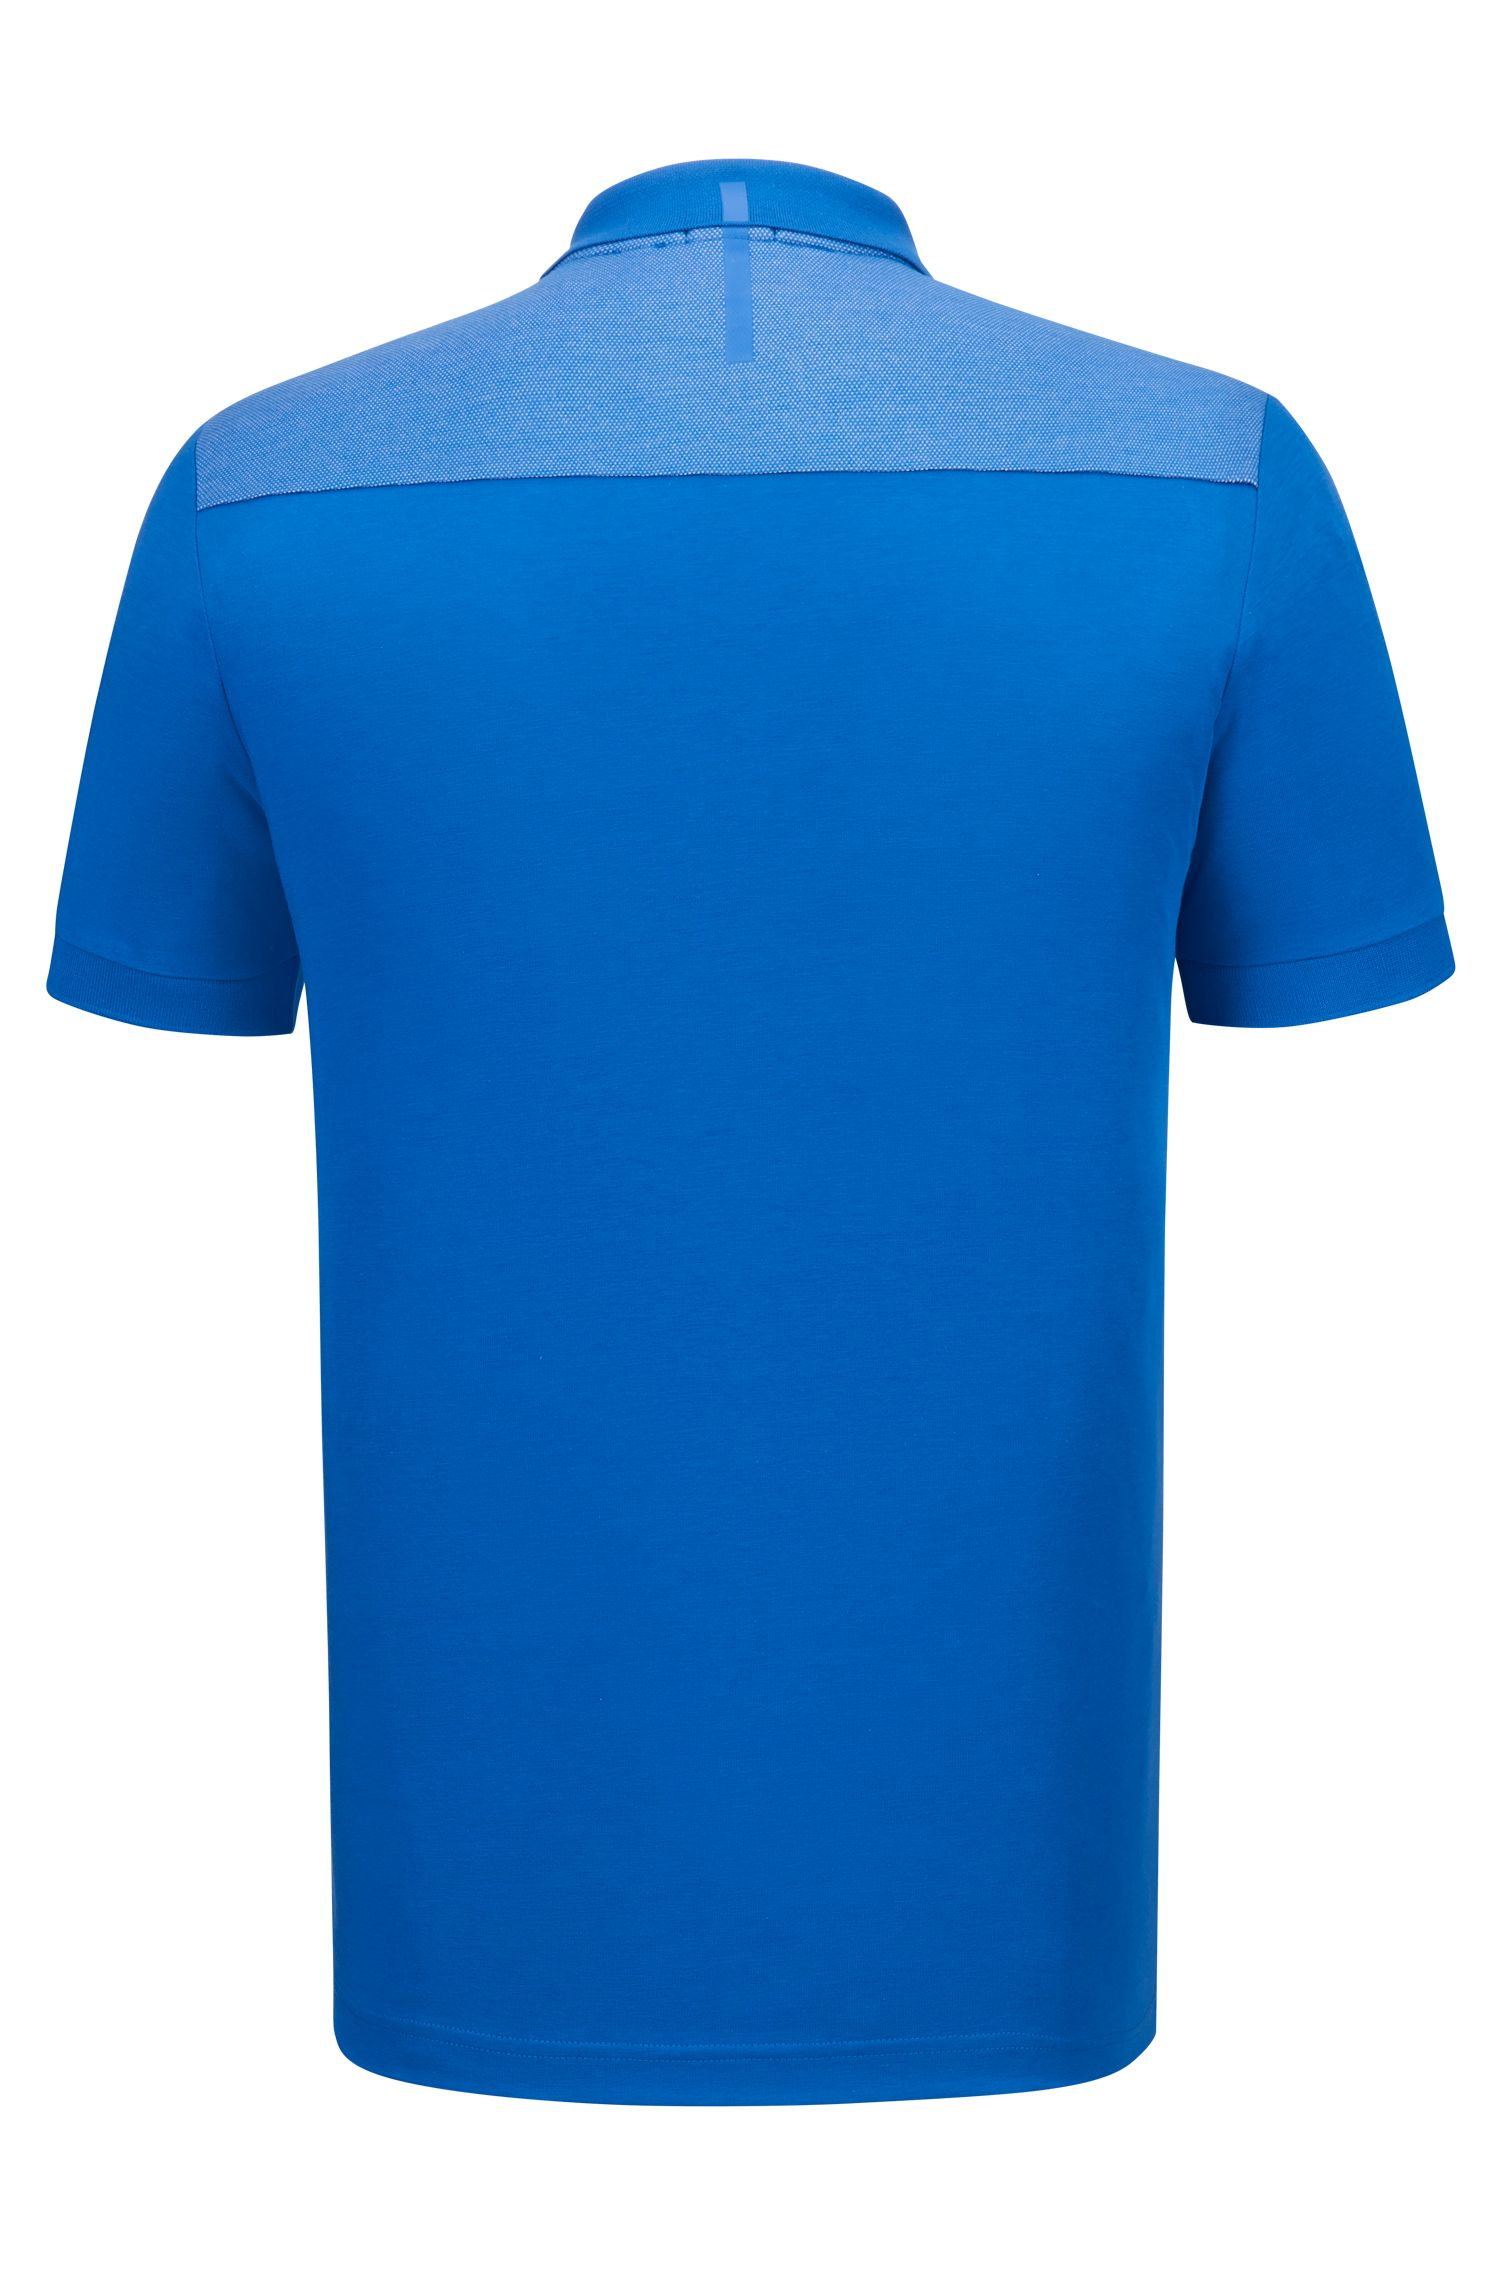 Moisture Manager Stretch Polo Shirt, Regular Fit | Philix